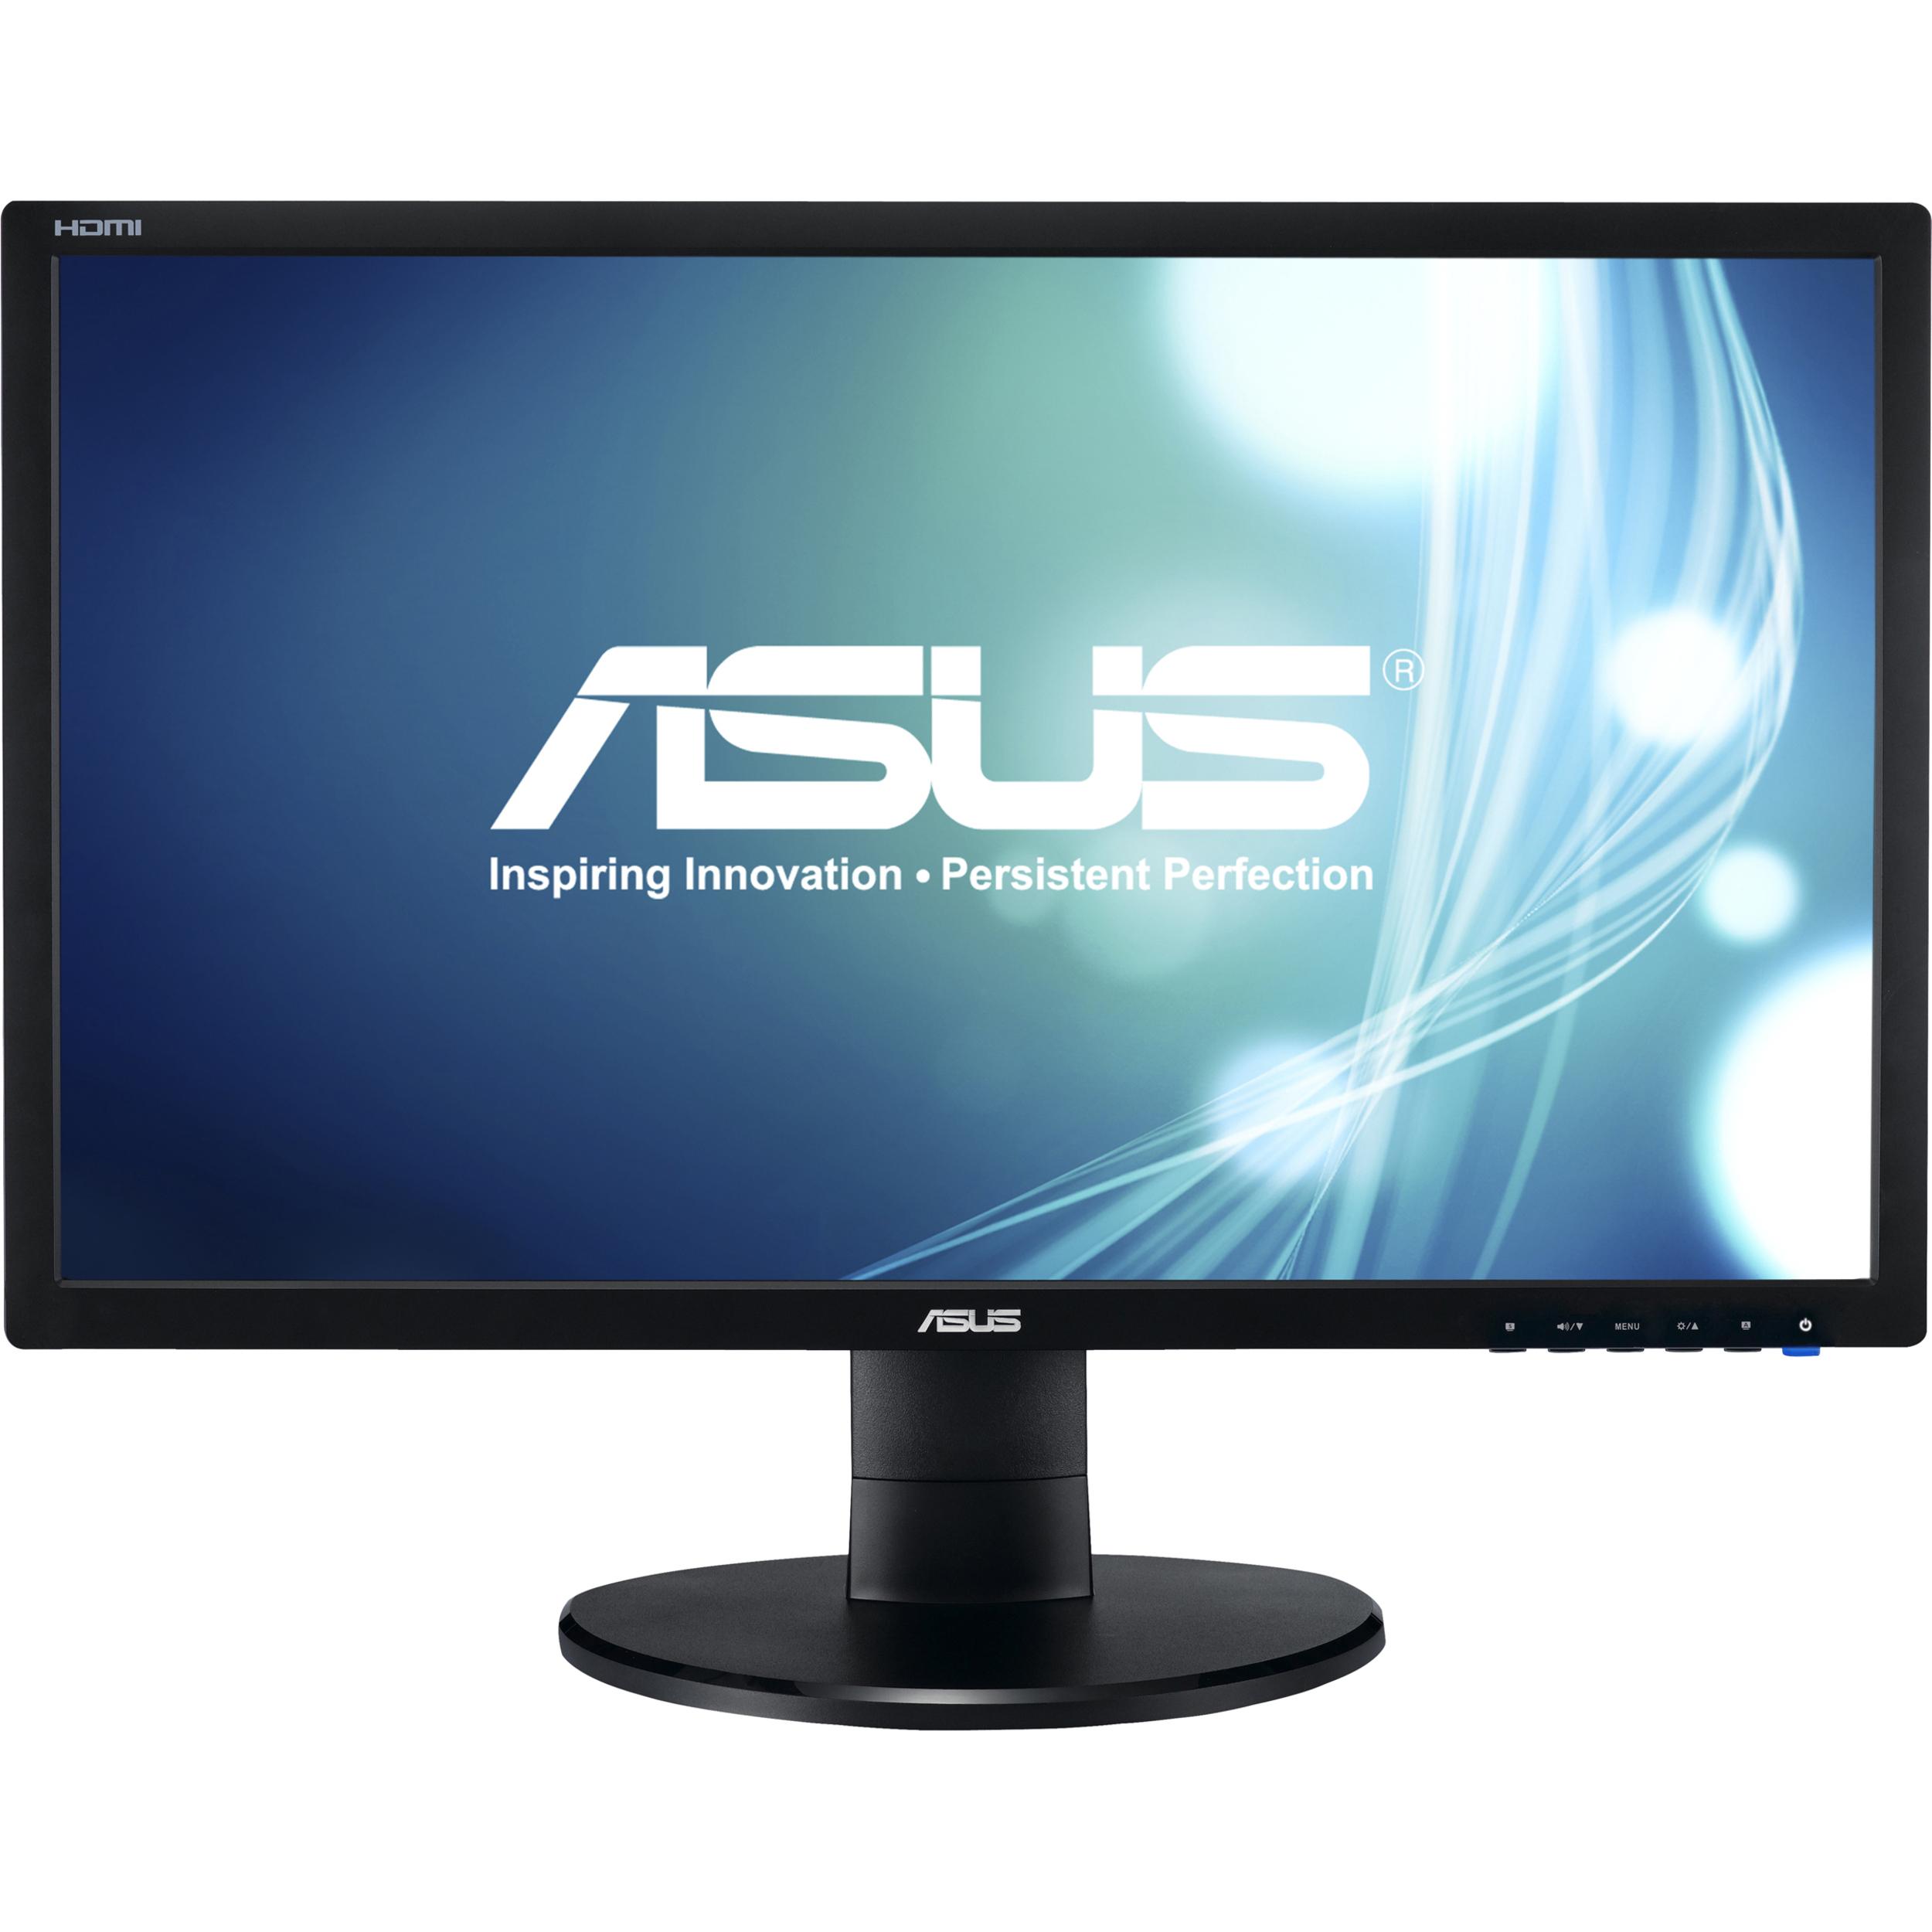 "Asus VE228H 21.5"" Full HD LED LCD Monitor - 16:9 - Black_subImage_1"